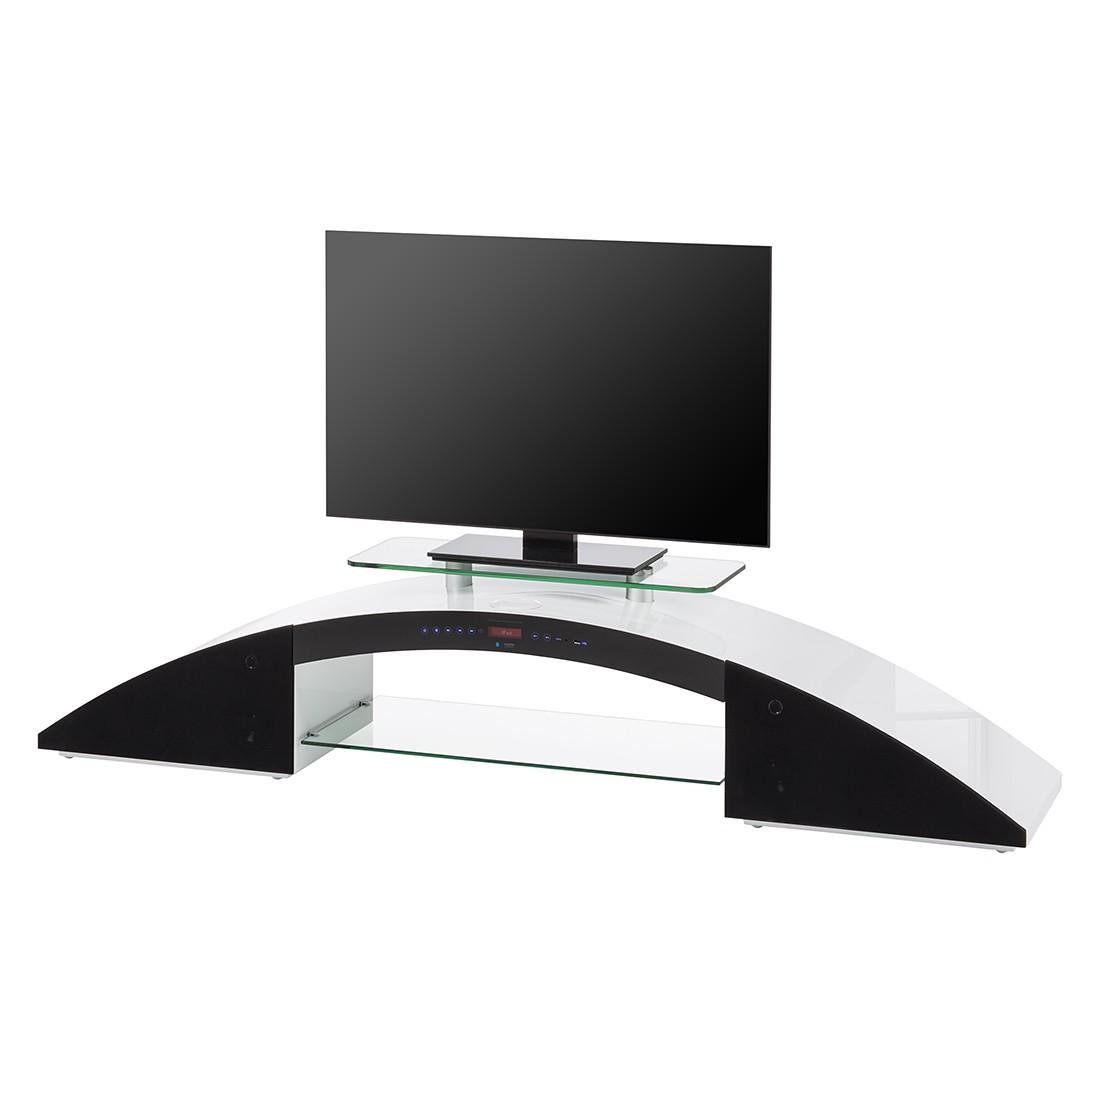 hifi rack car interior design. Black Bedroom Furniture Sets. Home Design Ideas